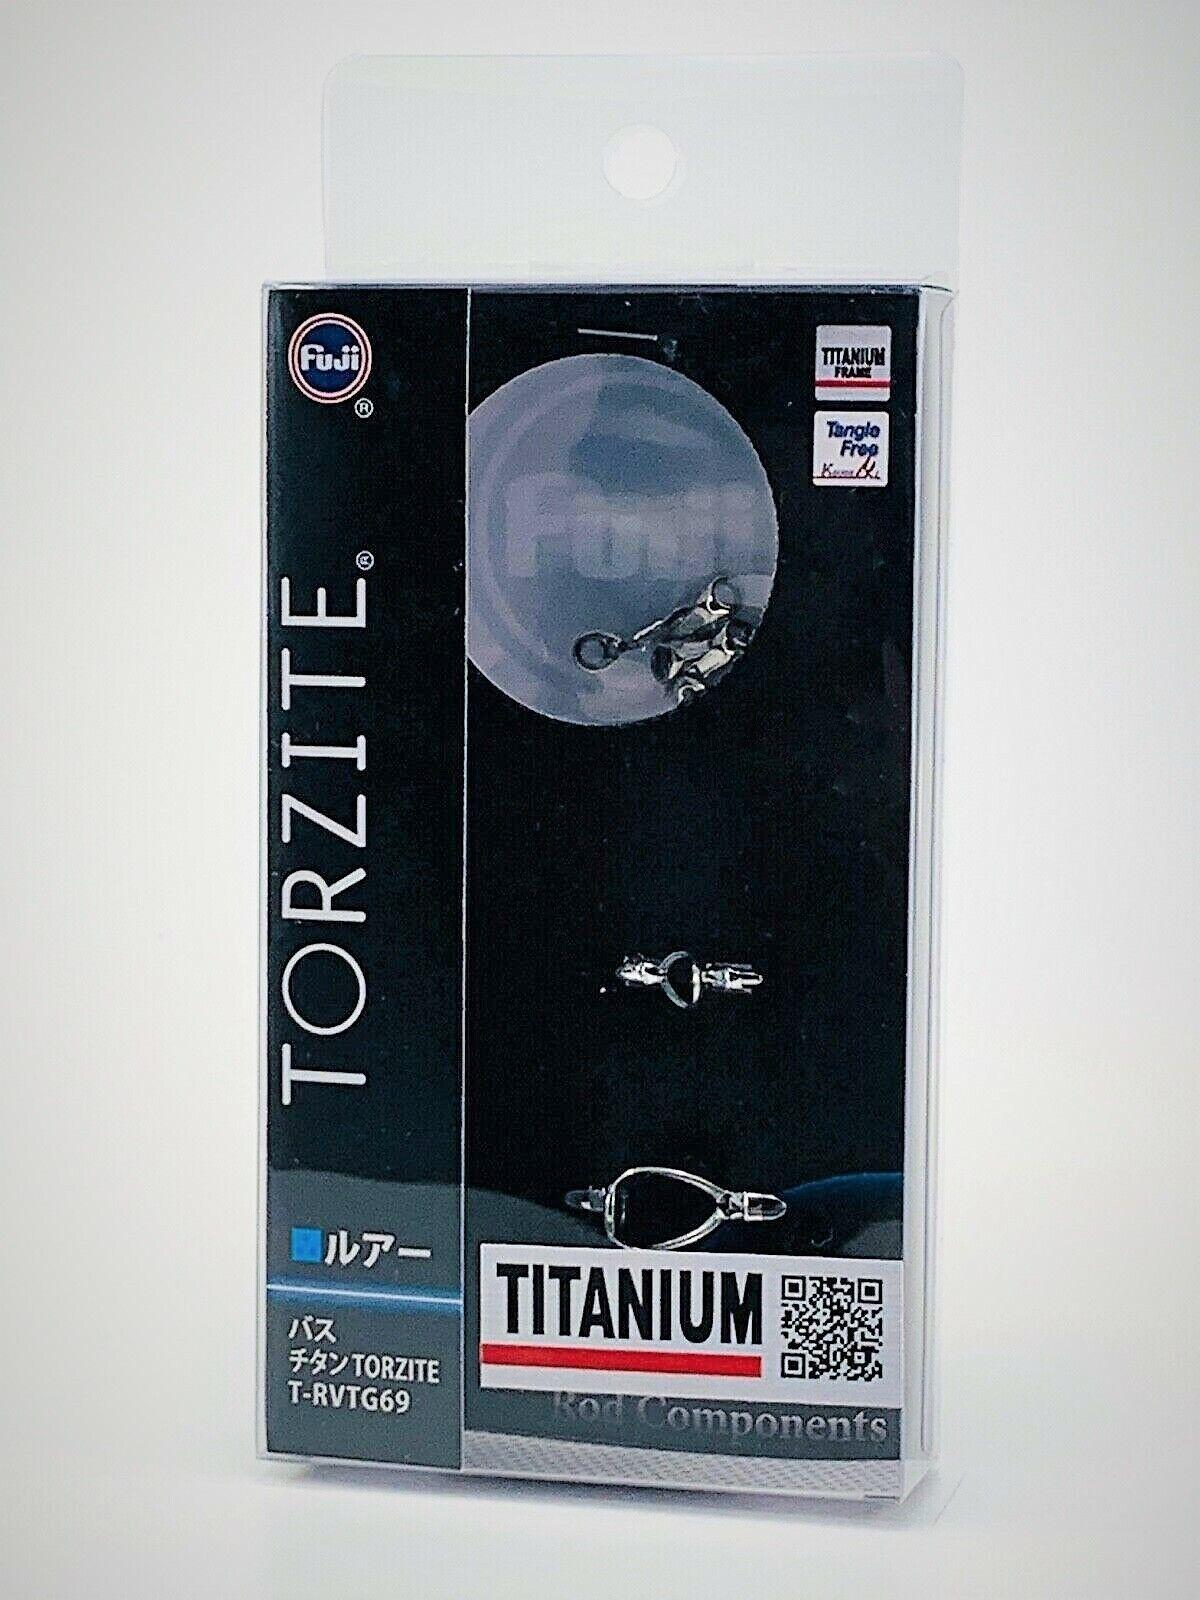 Fuji original Titanium TORZITE Bait Finesse Guide Set TRVTG 69 FREE SHIPPING